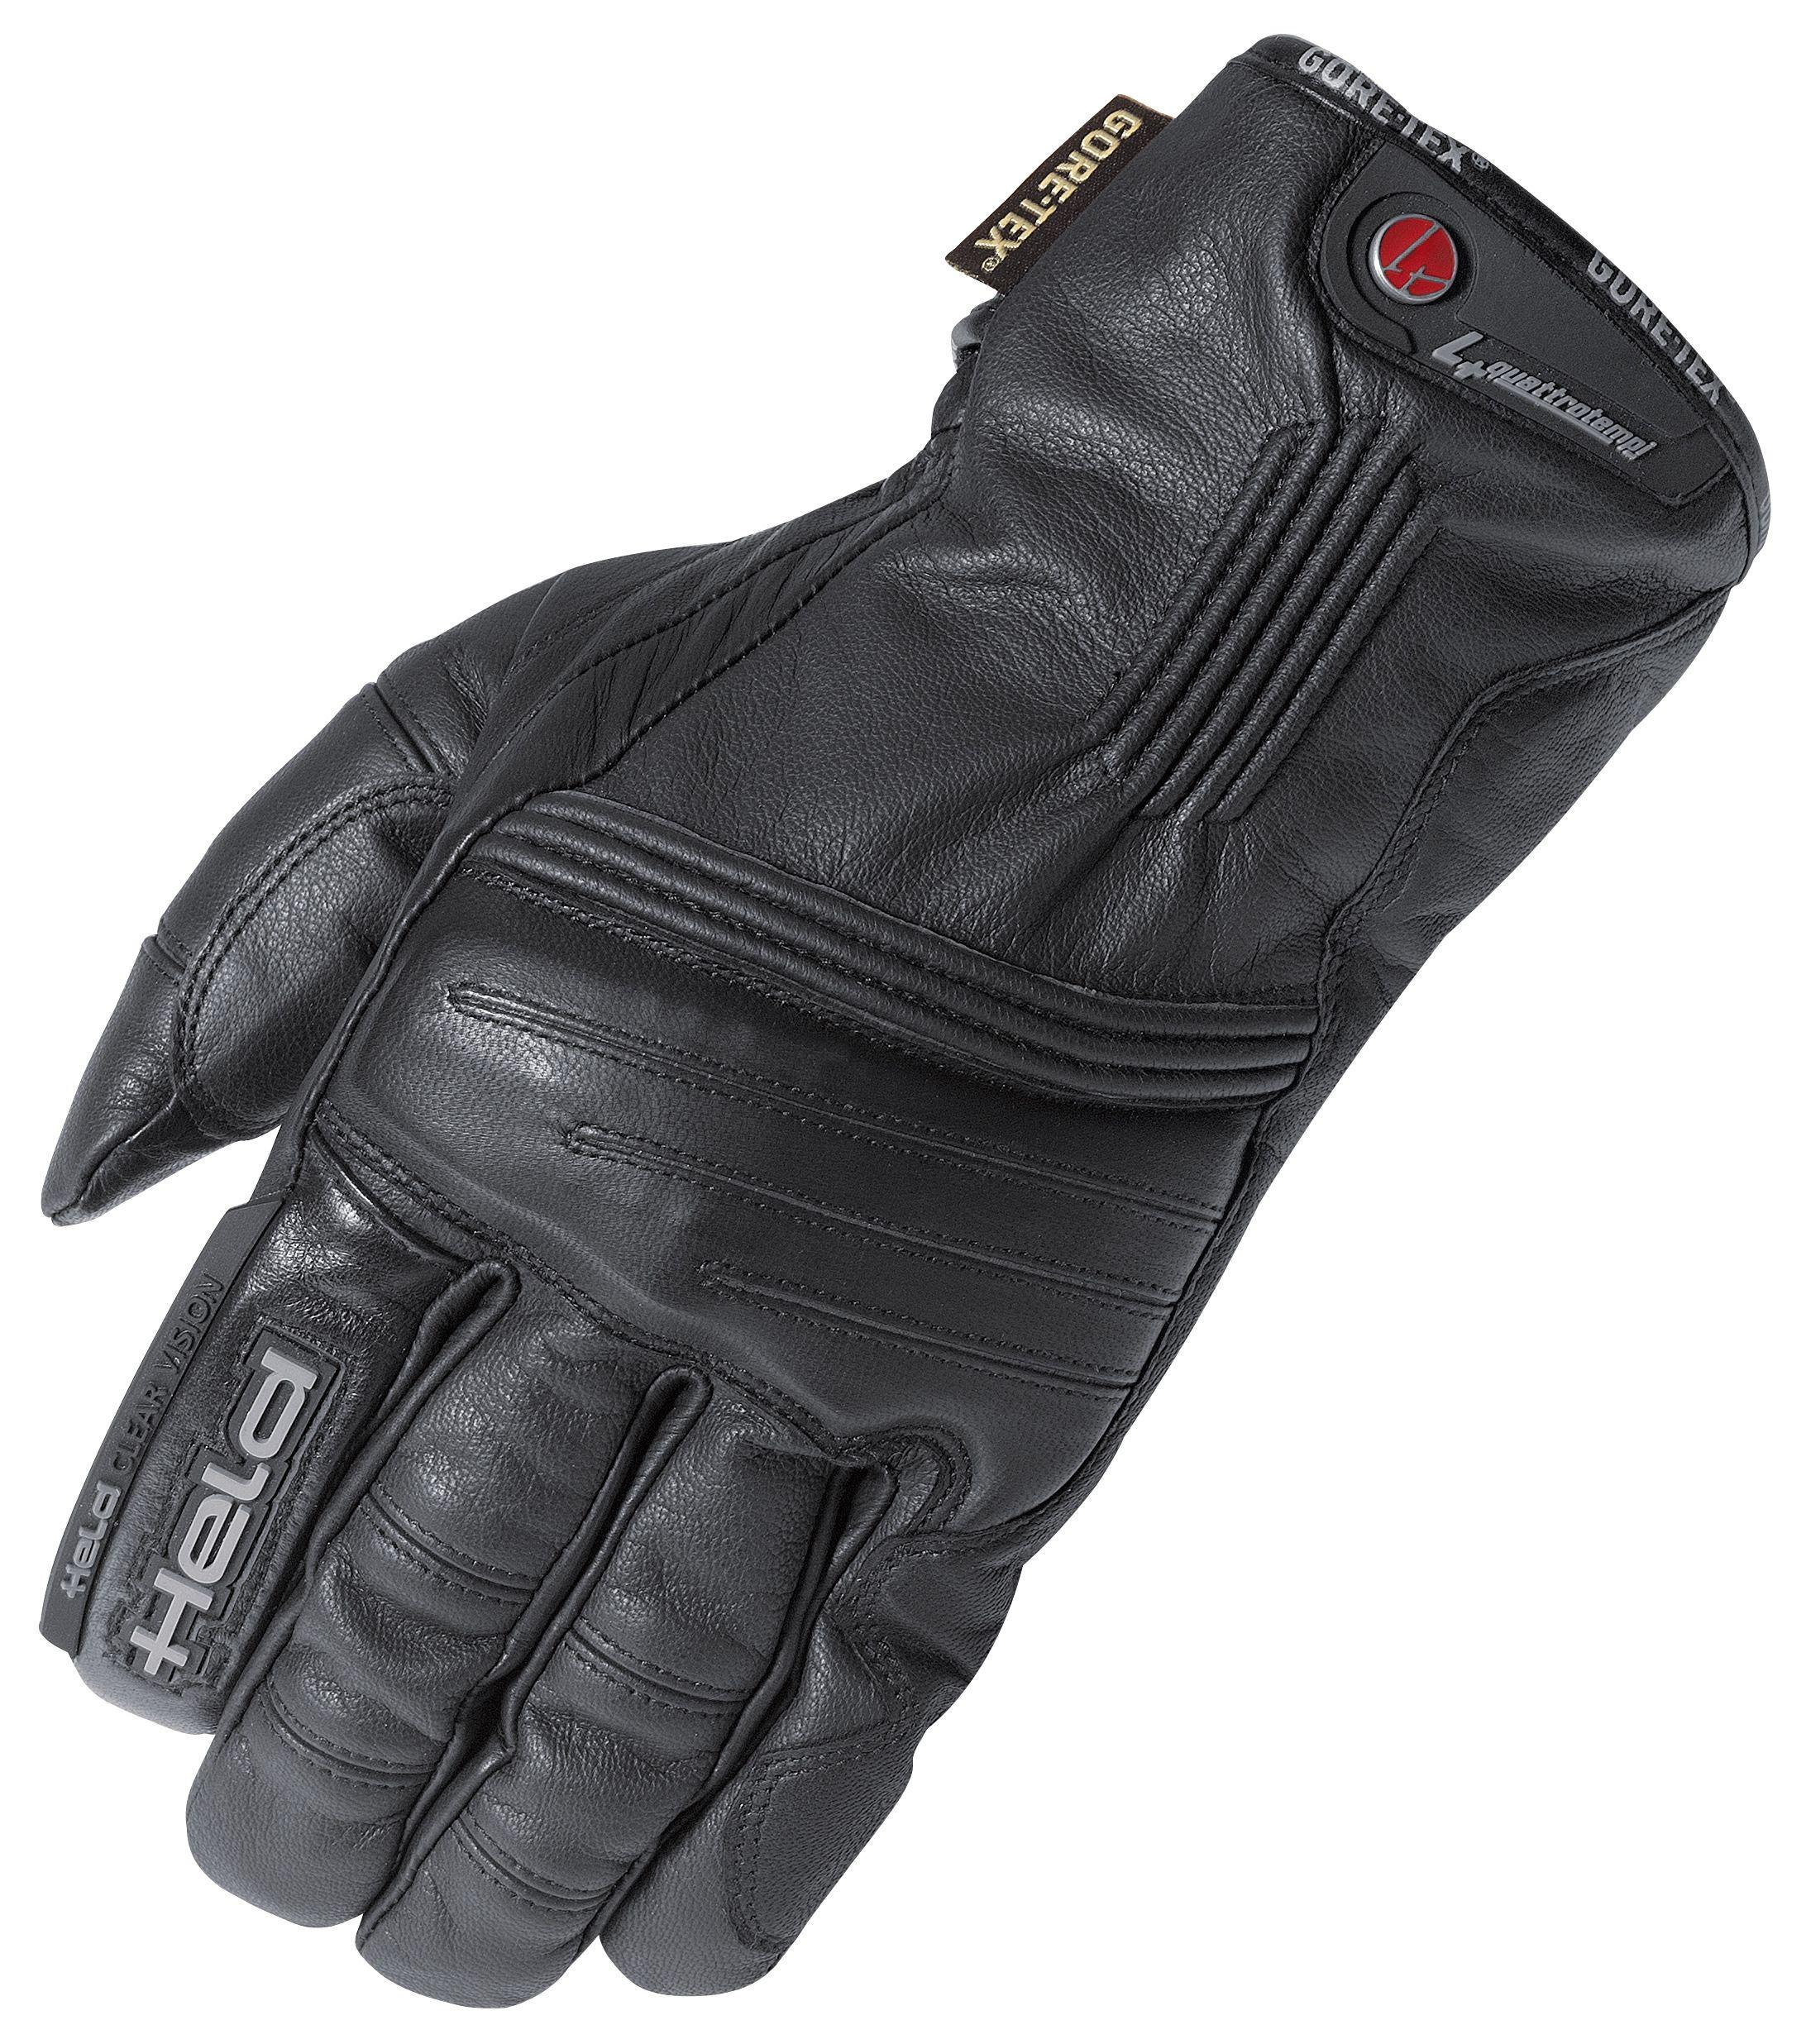 Xtrafit motorcycle gloves - Xtrafit Motorcycle Gloves 58